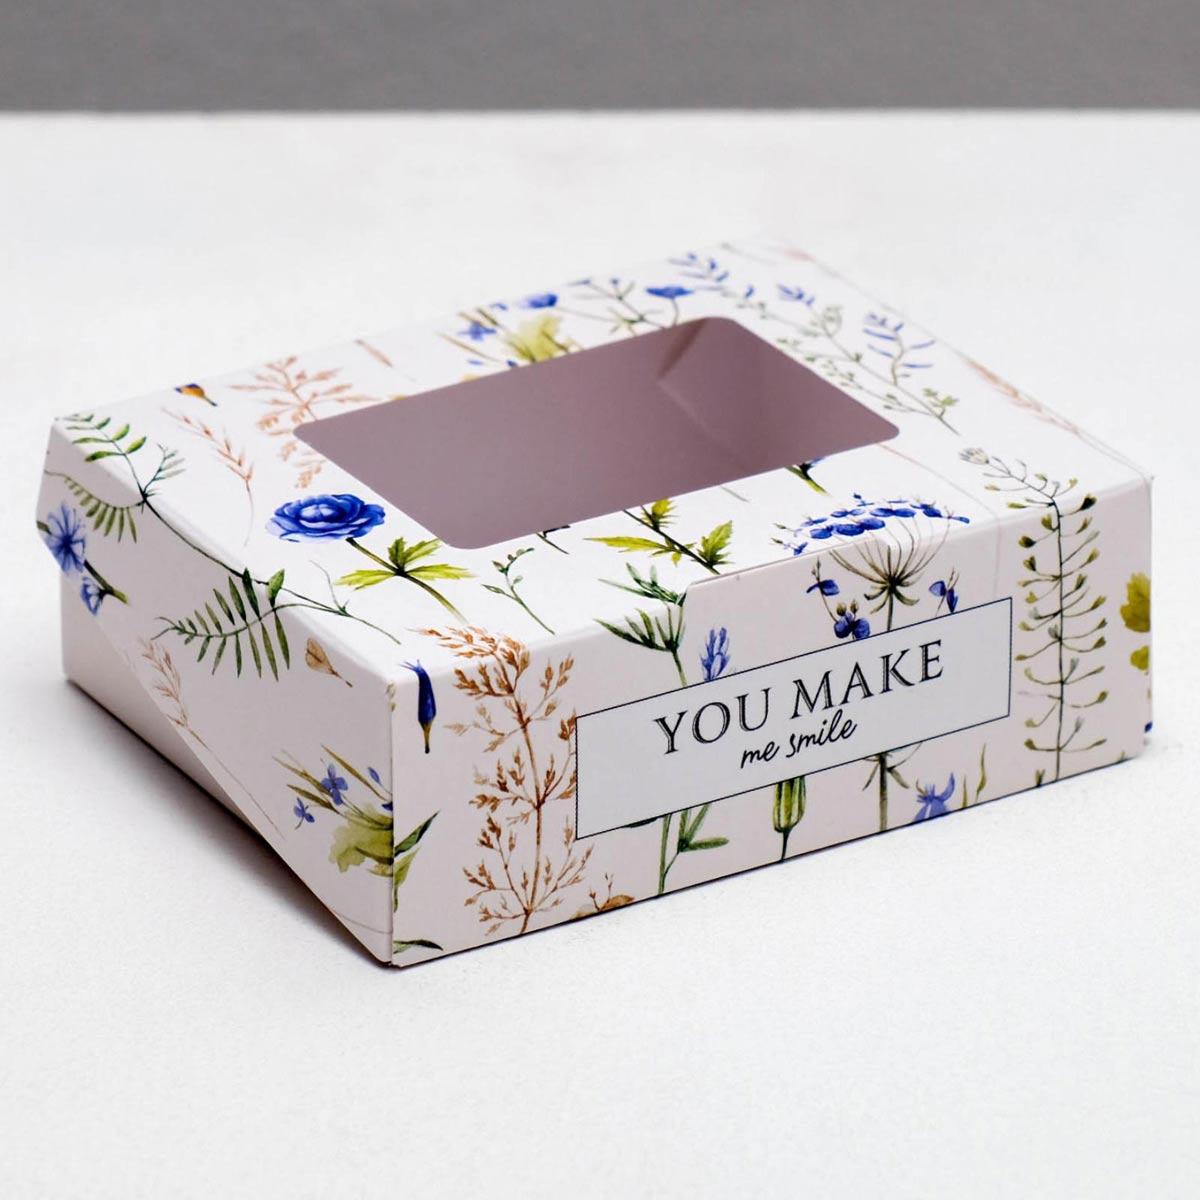 4747415 Коробка складная Flowers, 10*8*3.5 см